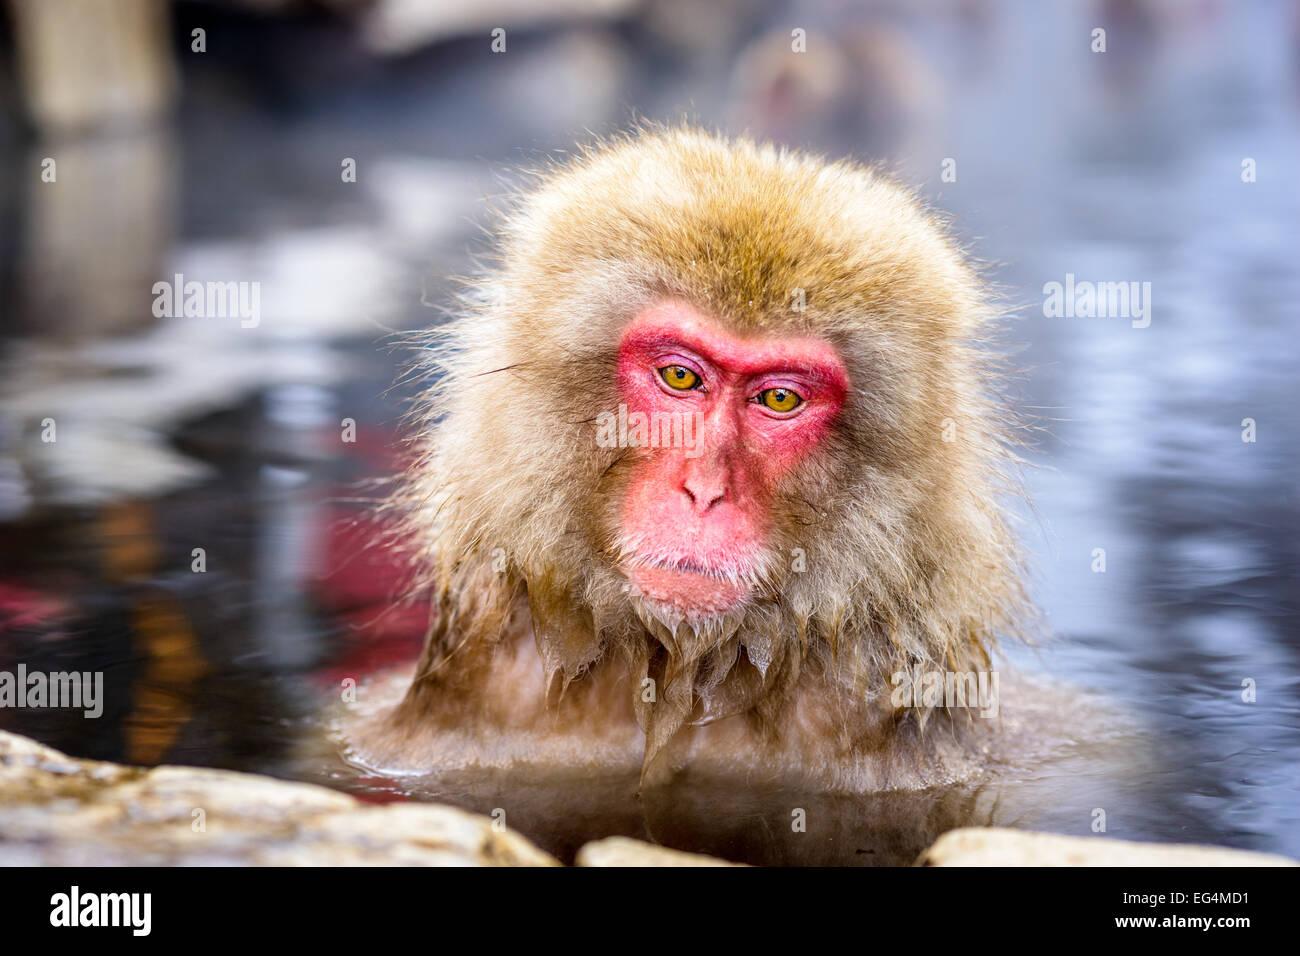 Snow Monkeys in Nagano, Japan. - Stock Image